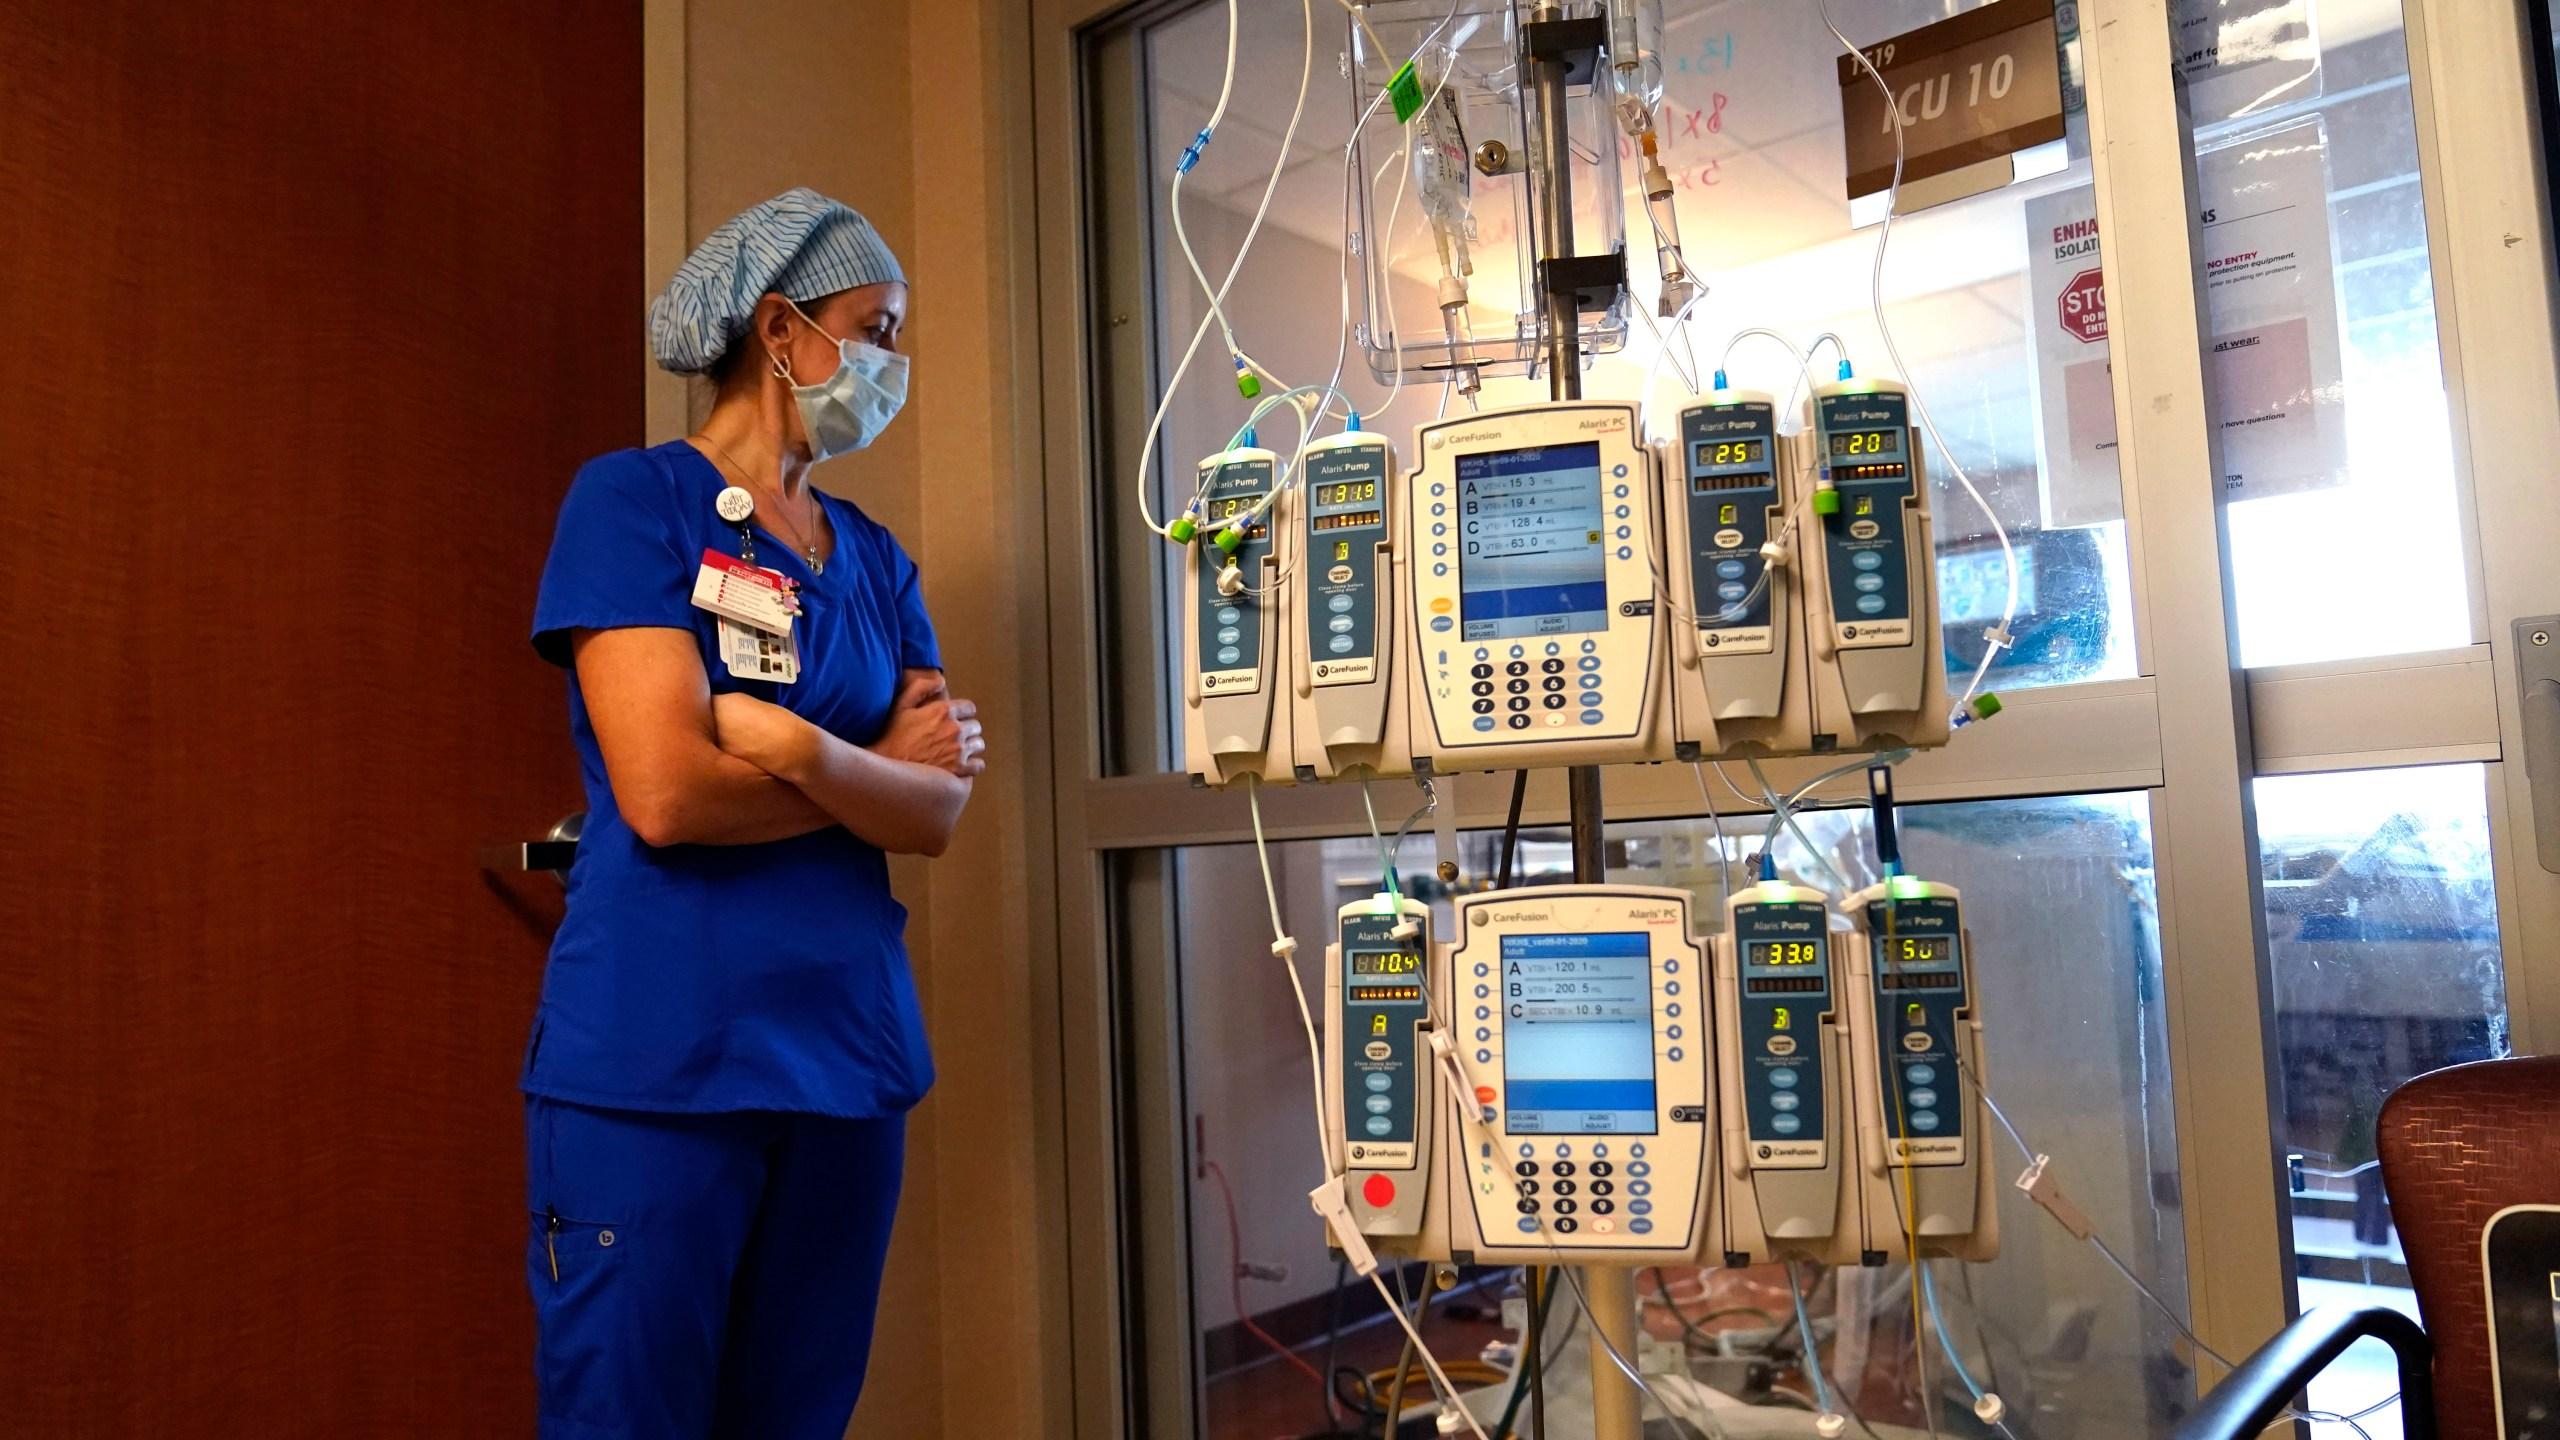 Nursing coordinator Beth Springer looks into a patient's room in a COVID-19 ward at the Willis-Knighton Medical Center in Shreveport, La., on Aug. 17, 2021. (Gerald Herbert / Associated Press)